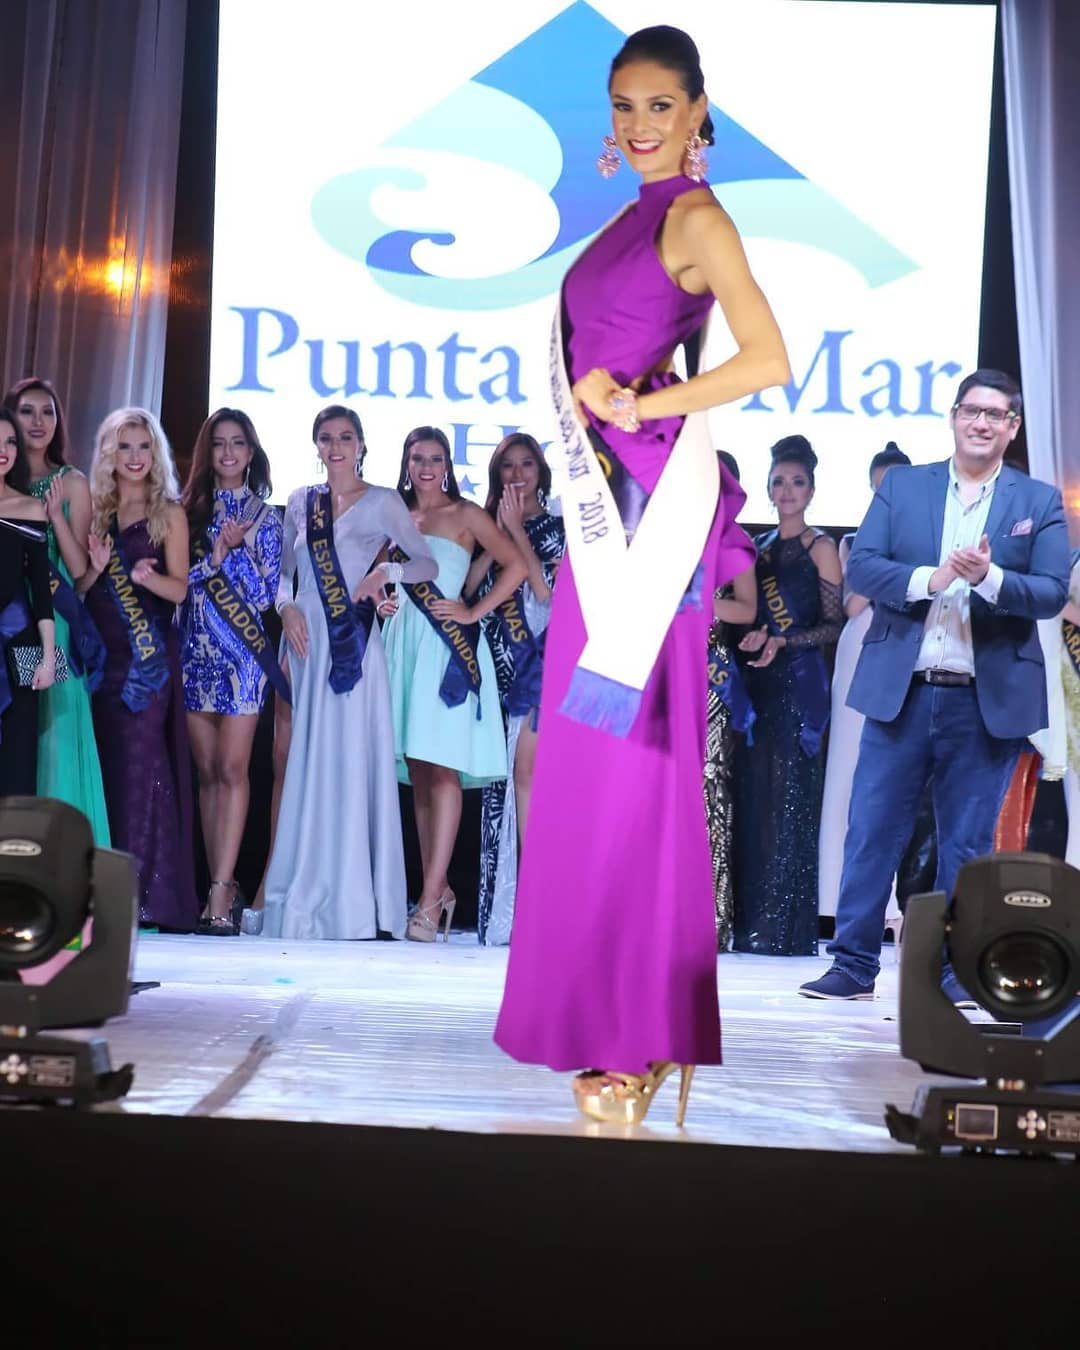 andrea saenz, miss continentes unidos 2018. - Página 4 40696911